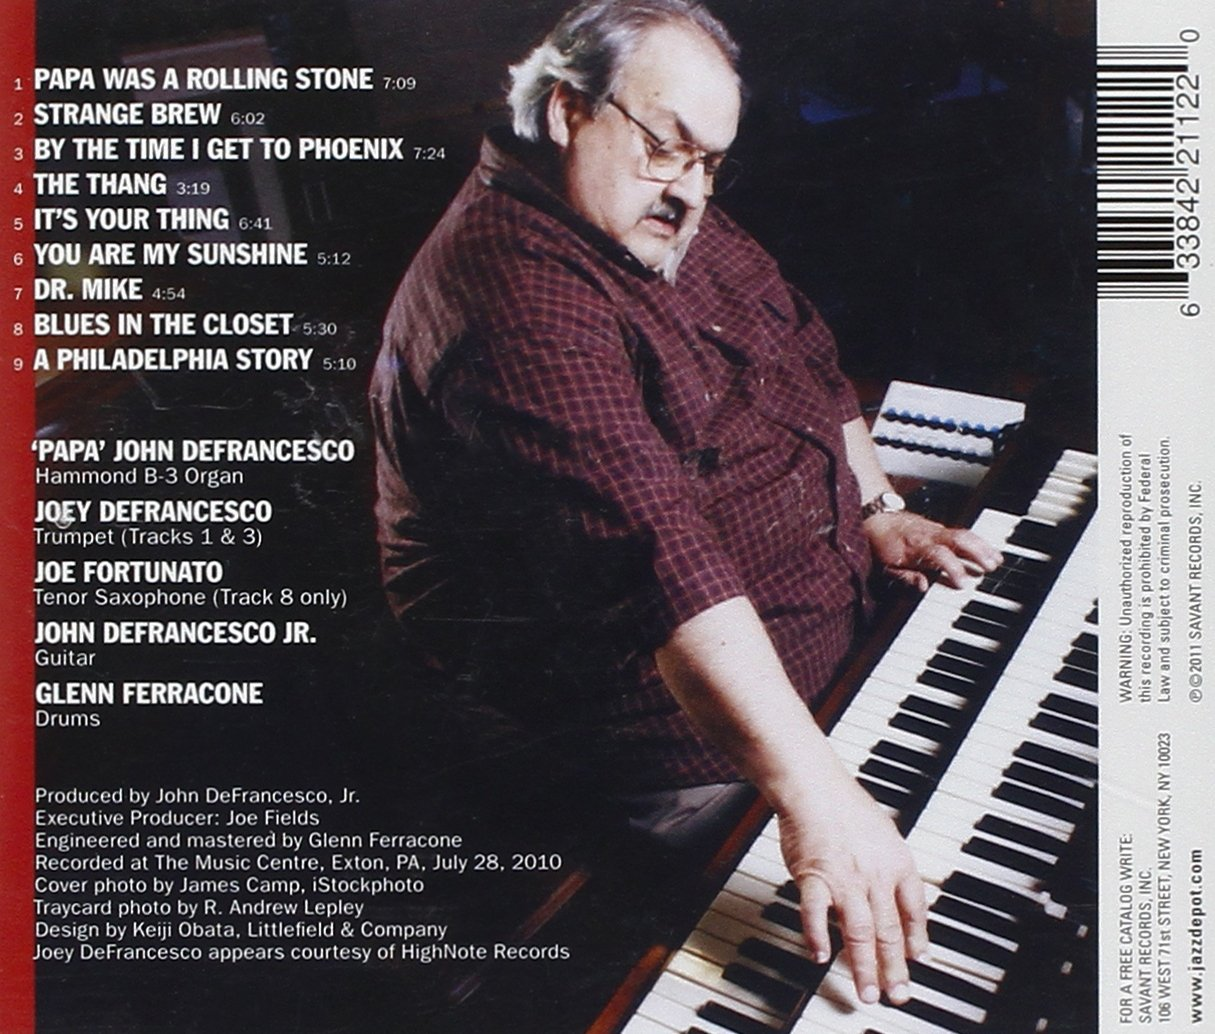 papa john defrancesco a philadelphia story amazon com music